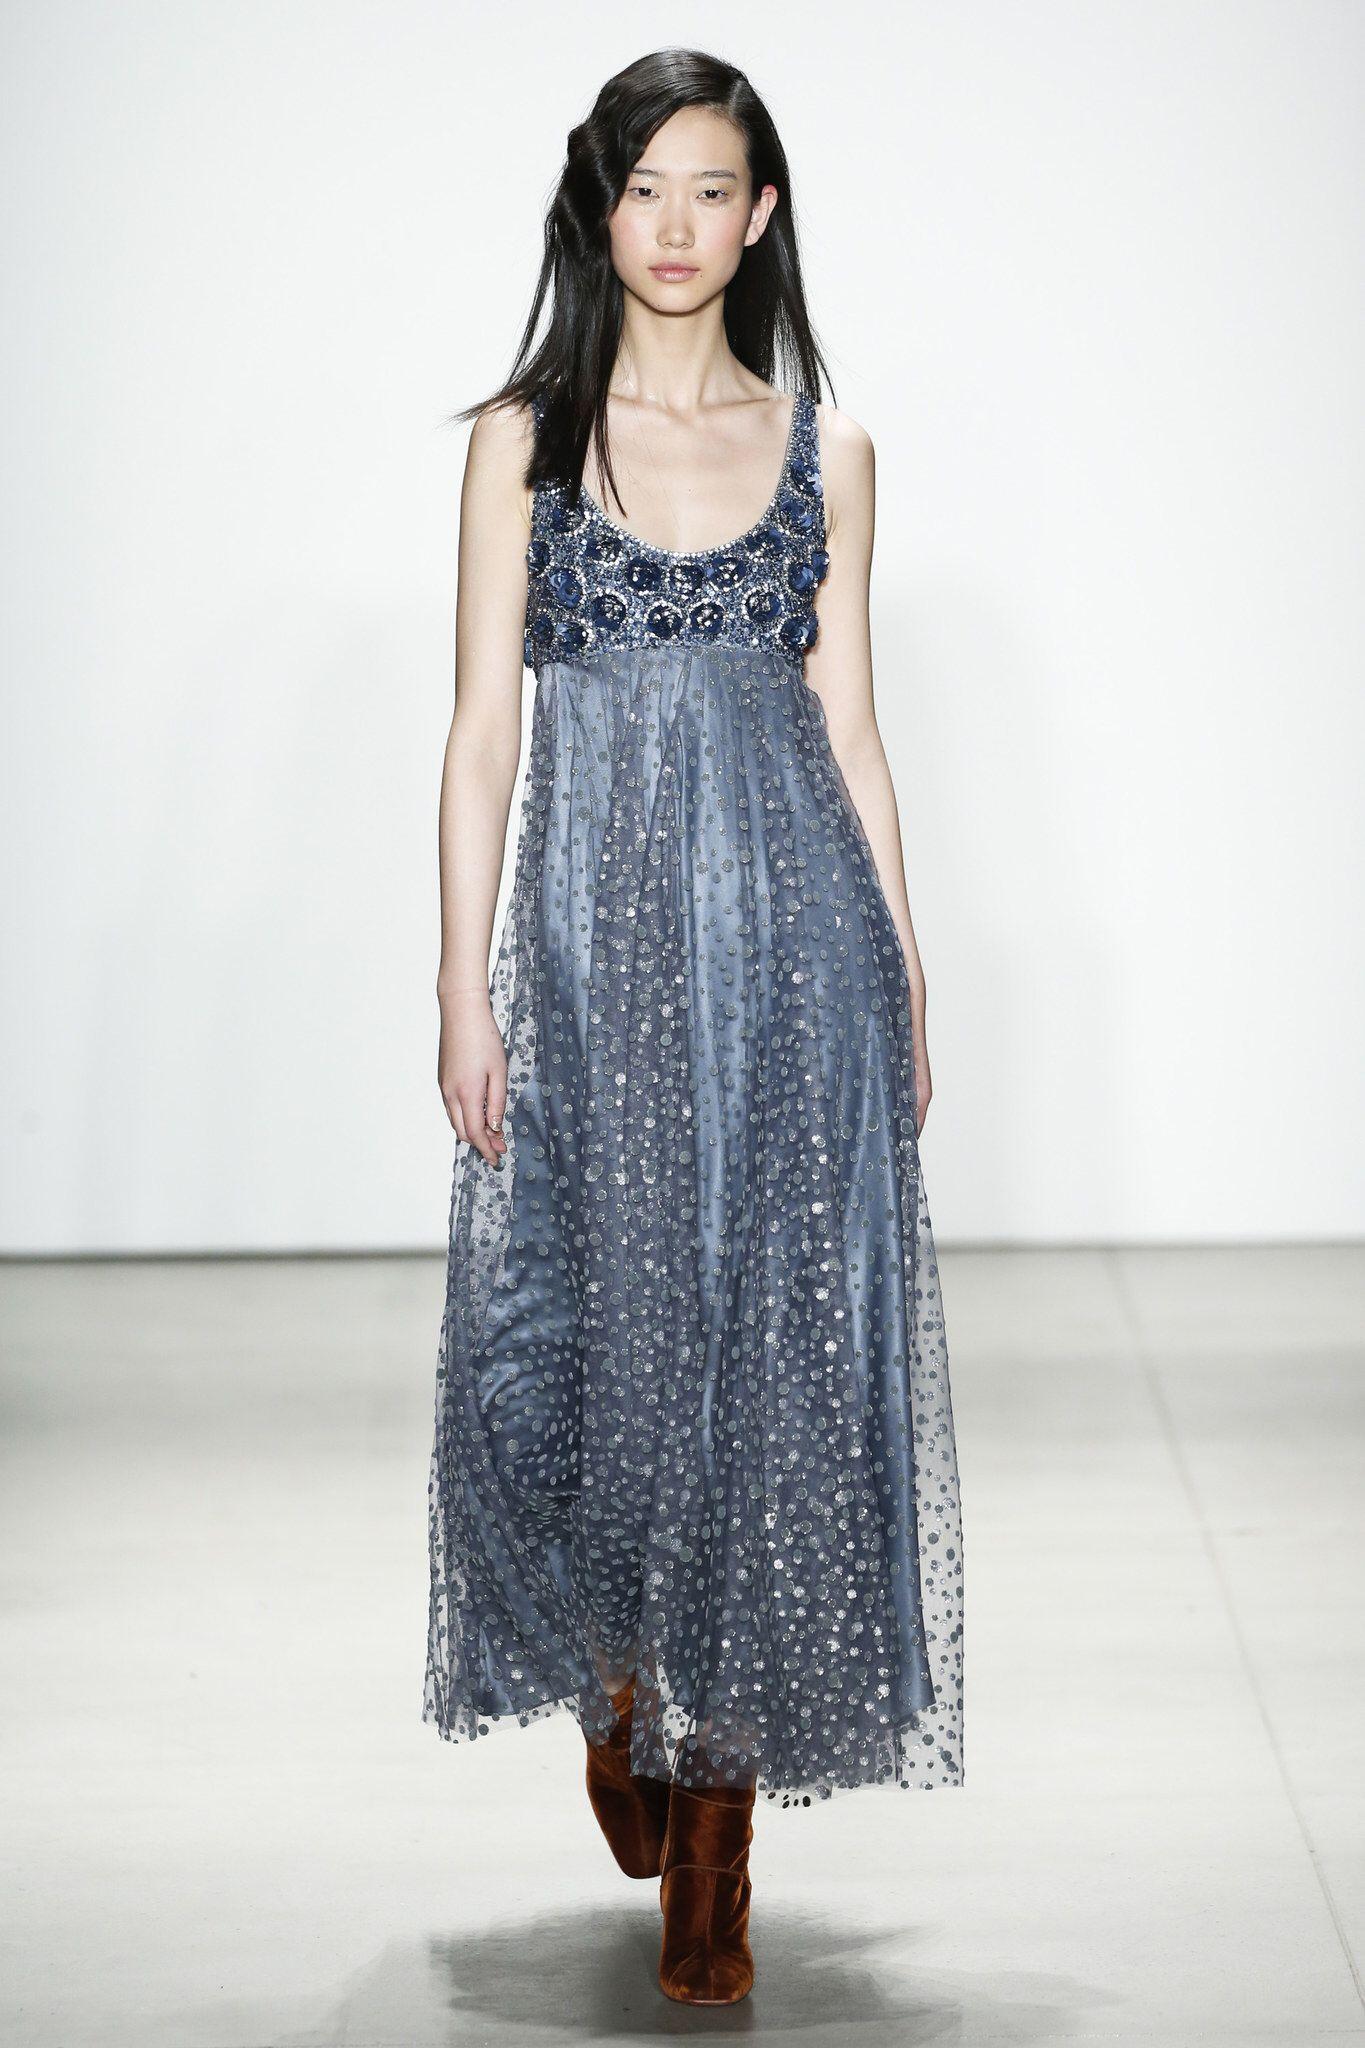 bd9200eb45e9 Jenny Packham Fall 2016 Ready-to-Wear Fashion Show